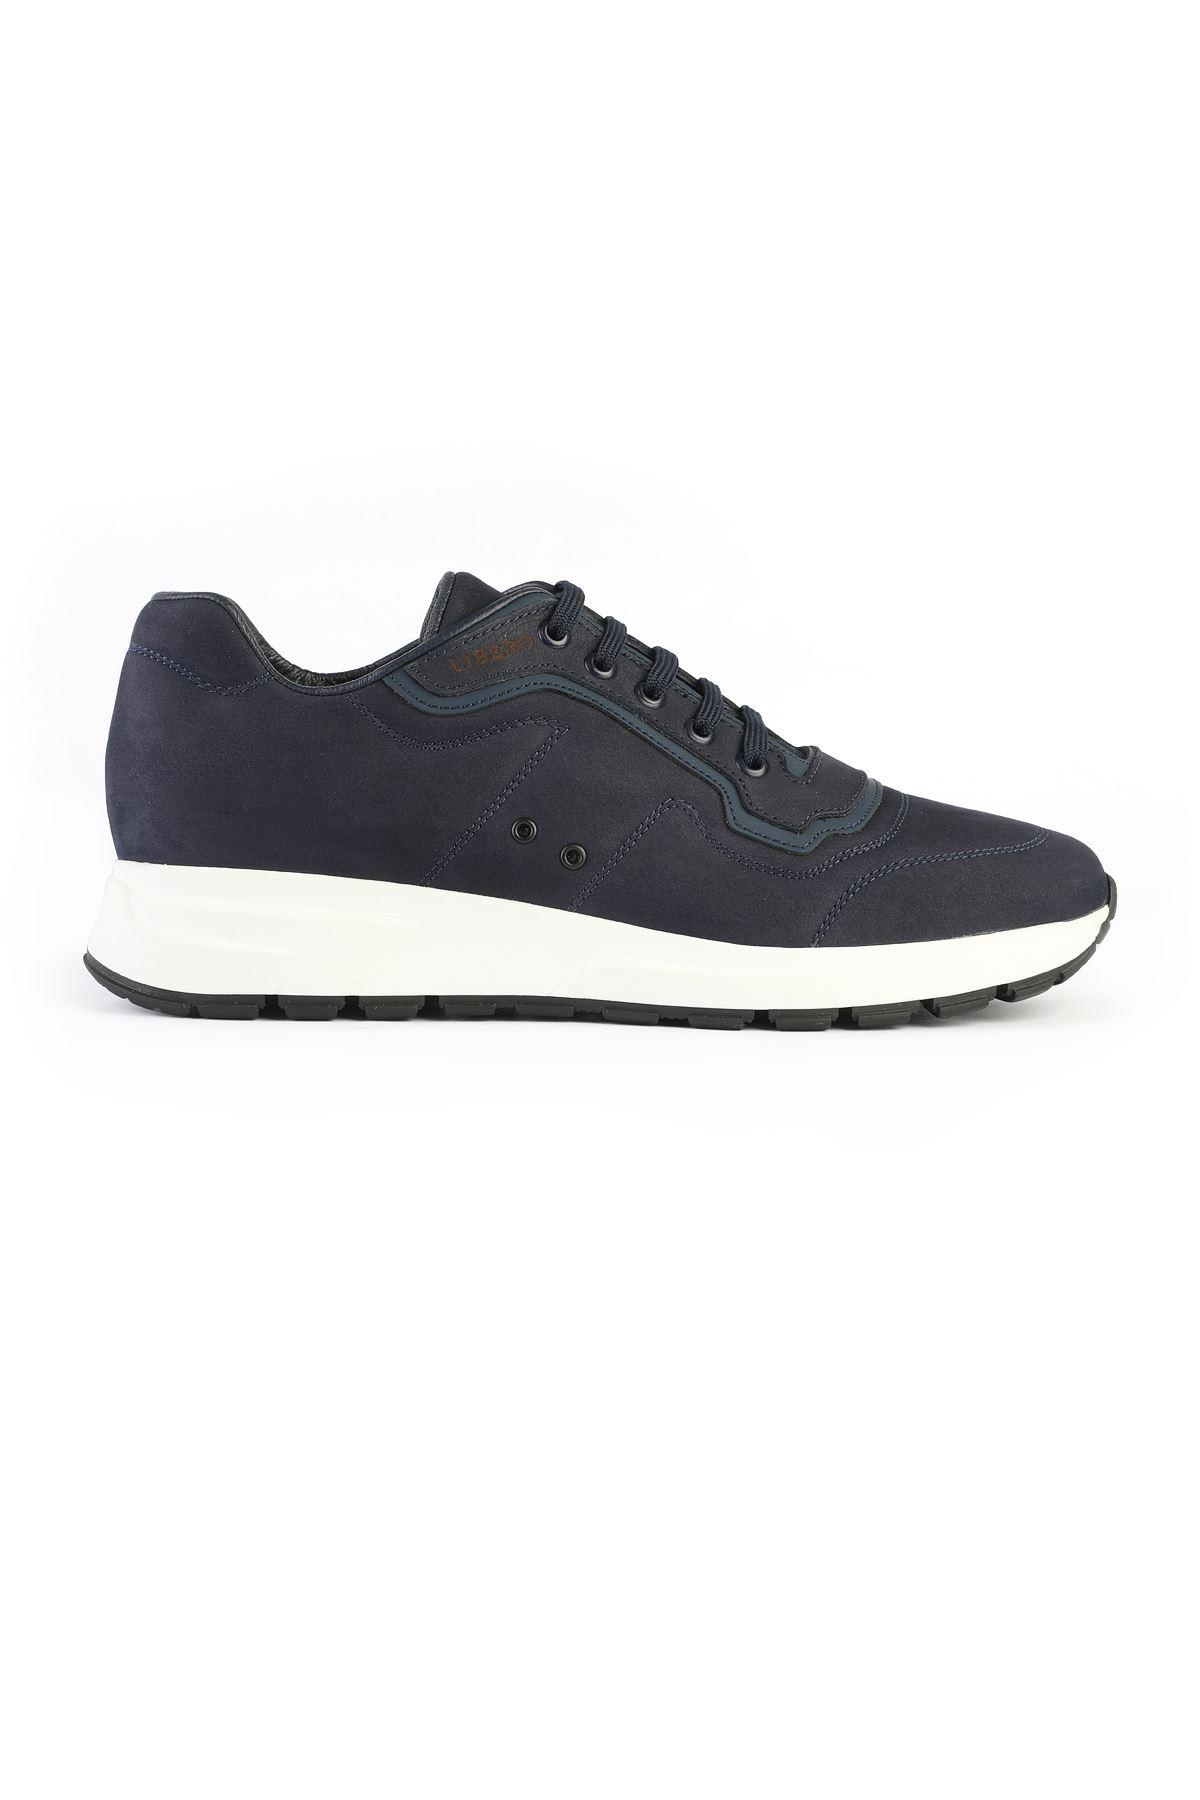 Libero 3149 Navy Blue Sport Shoes